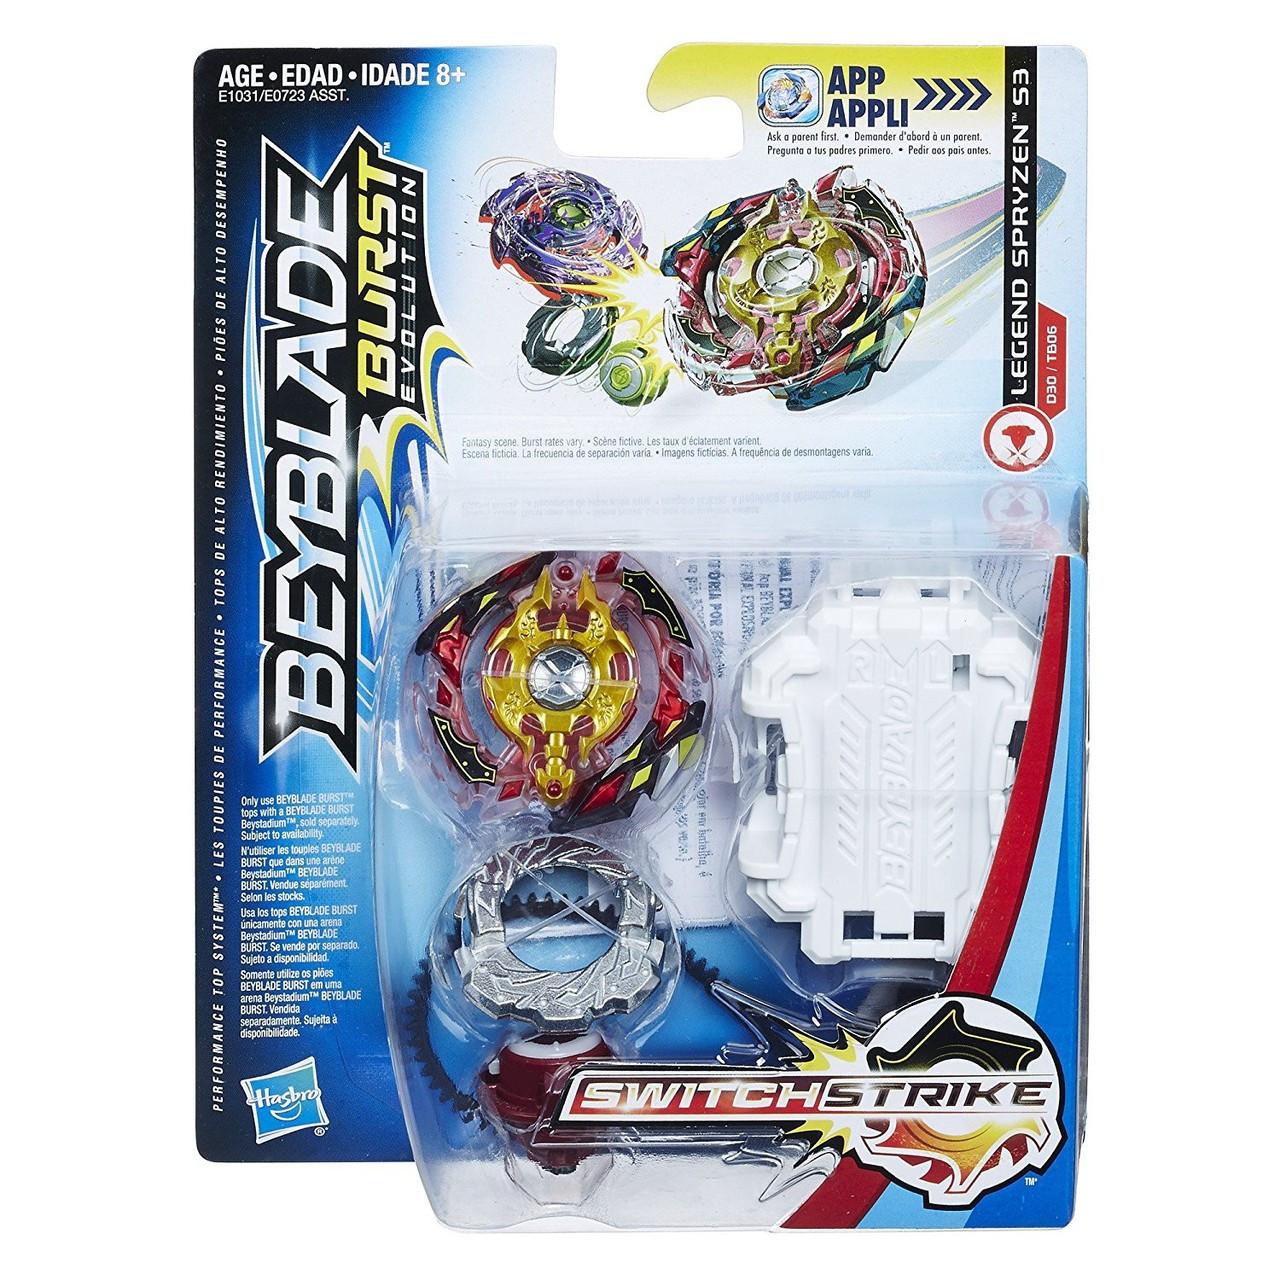 Switch It Up Toys : Beyblade burst switchstrike legend spryzen s starter pack